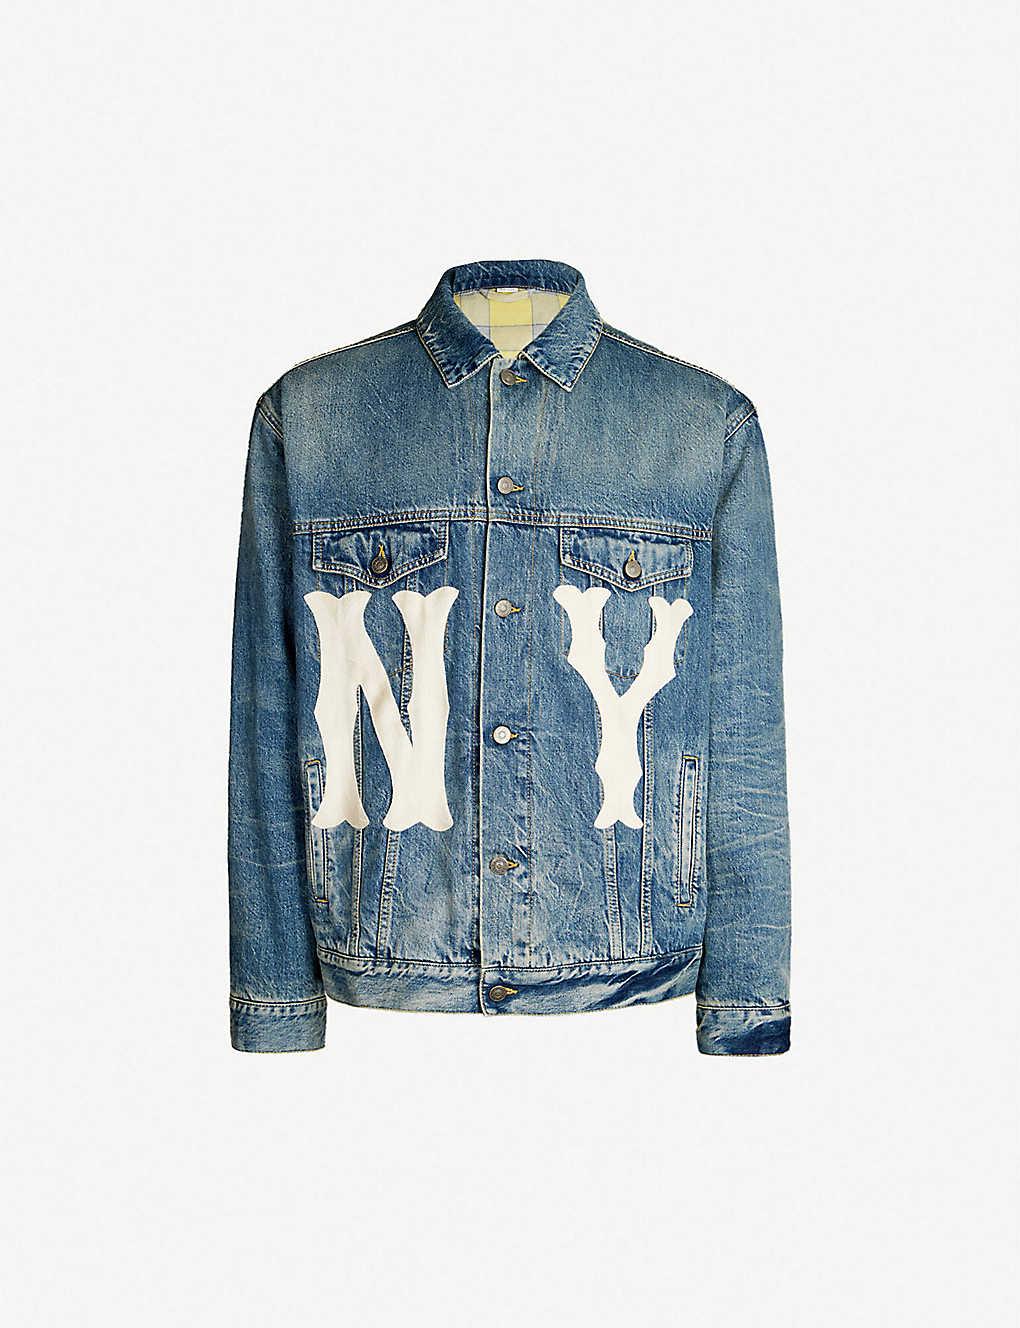 6f84f929e33e GUCCI - NY Yankees™ patch denim jacket | Selfridges.com